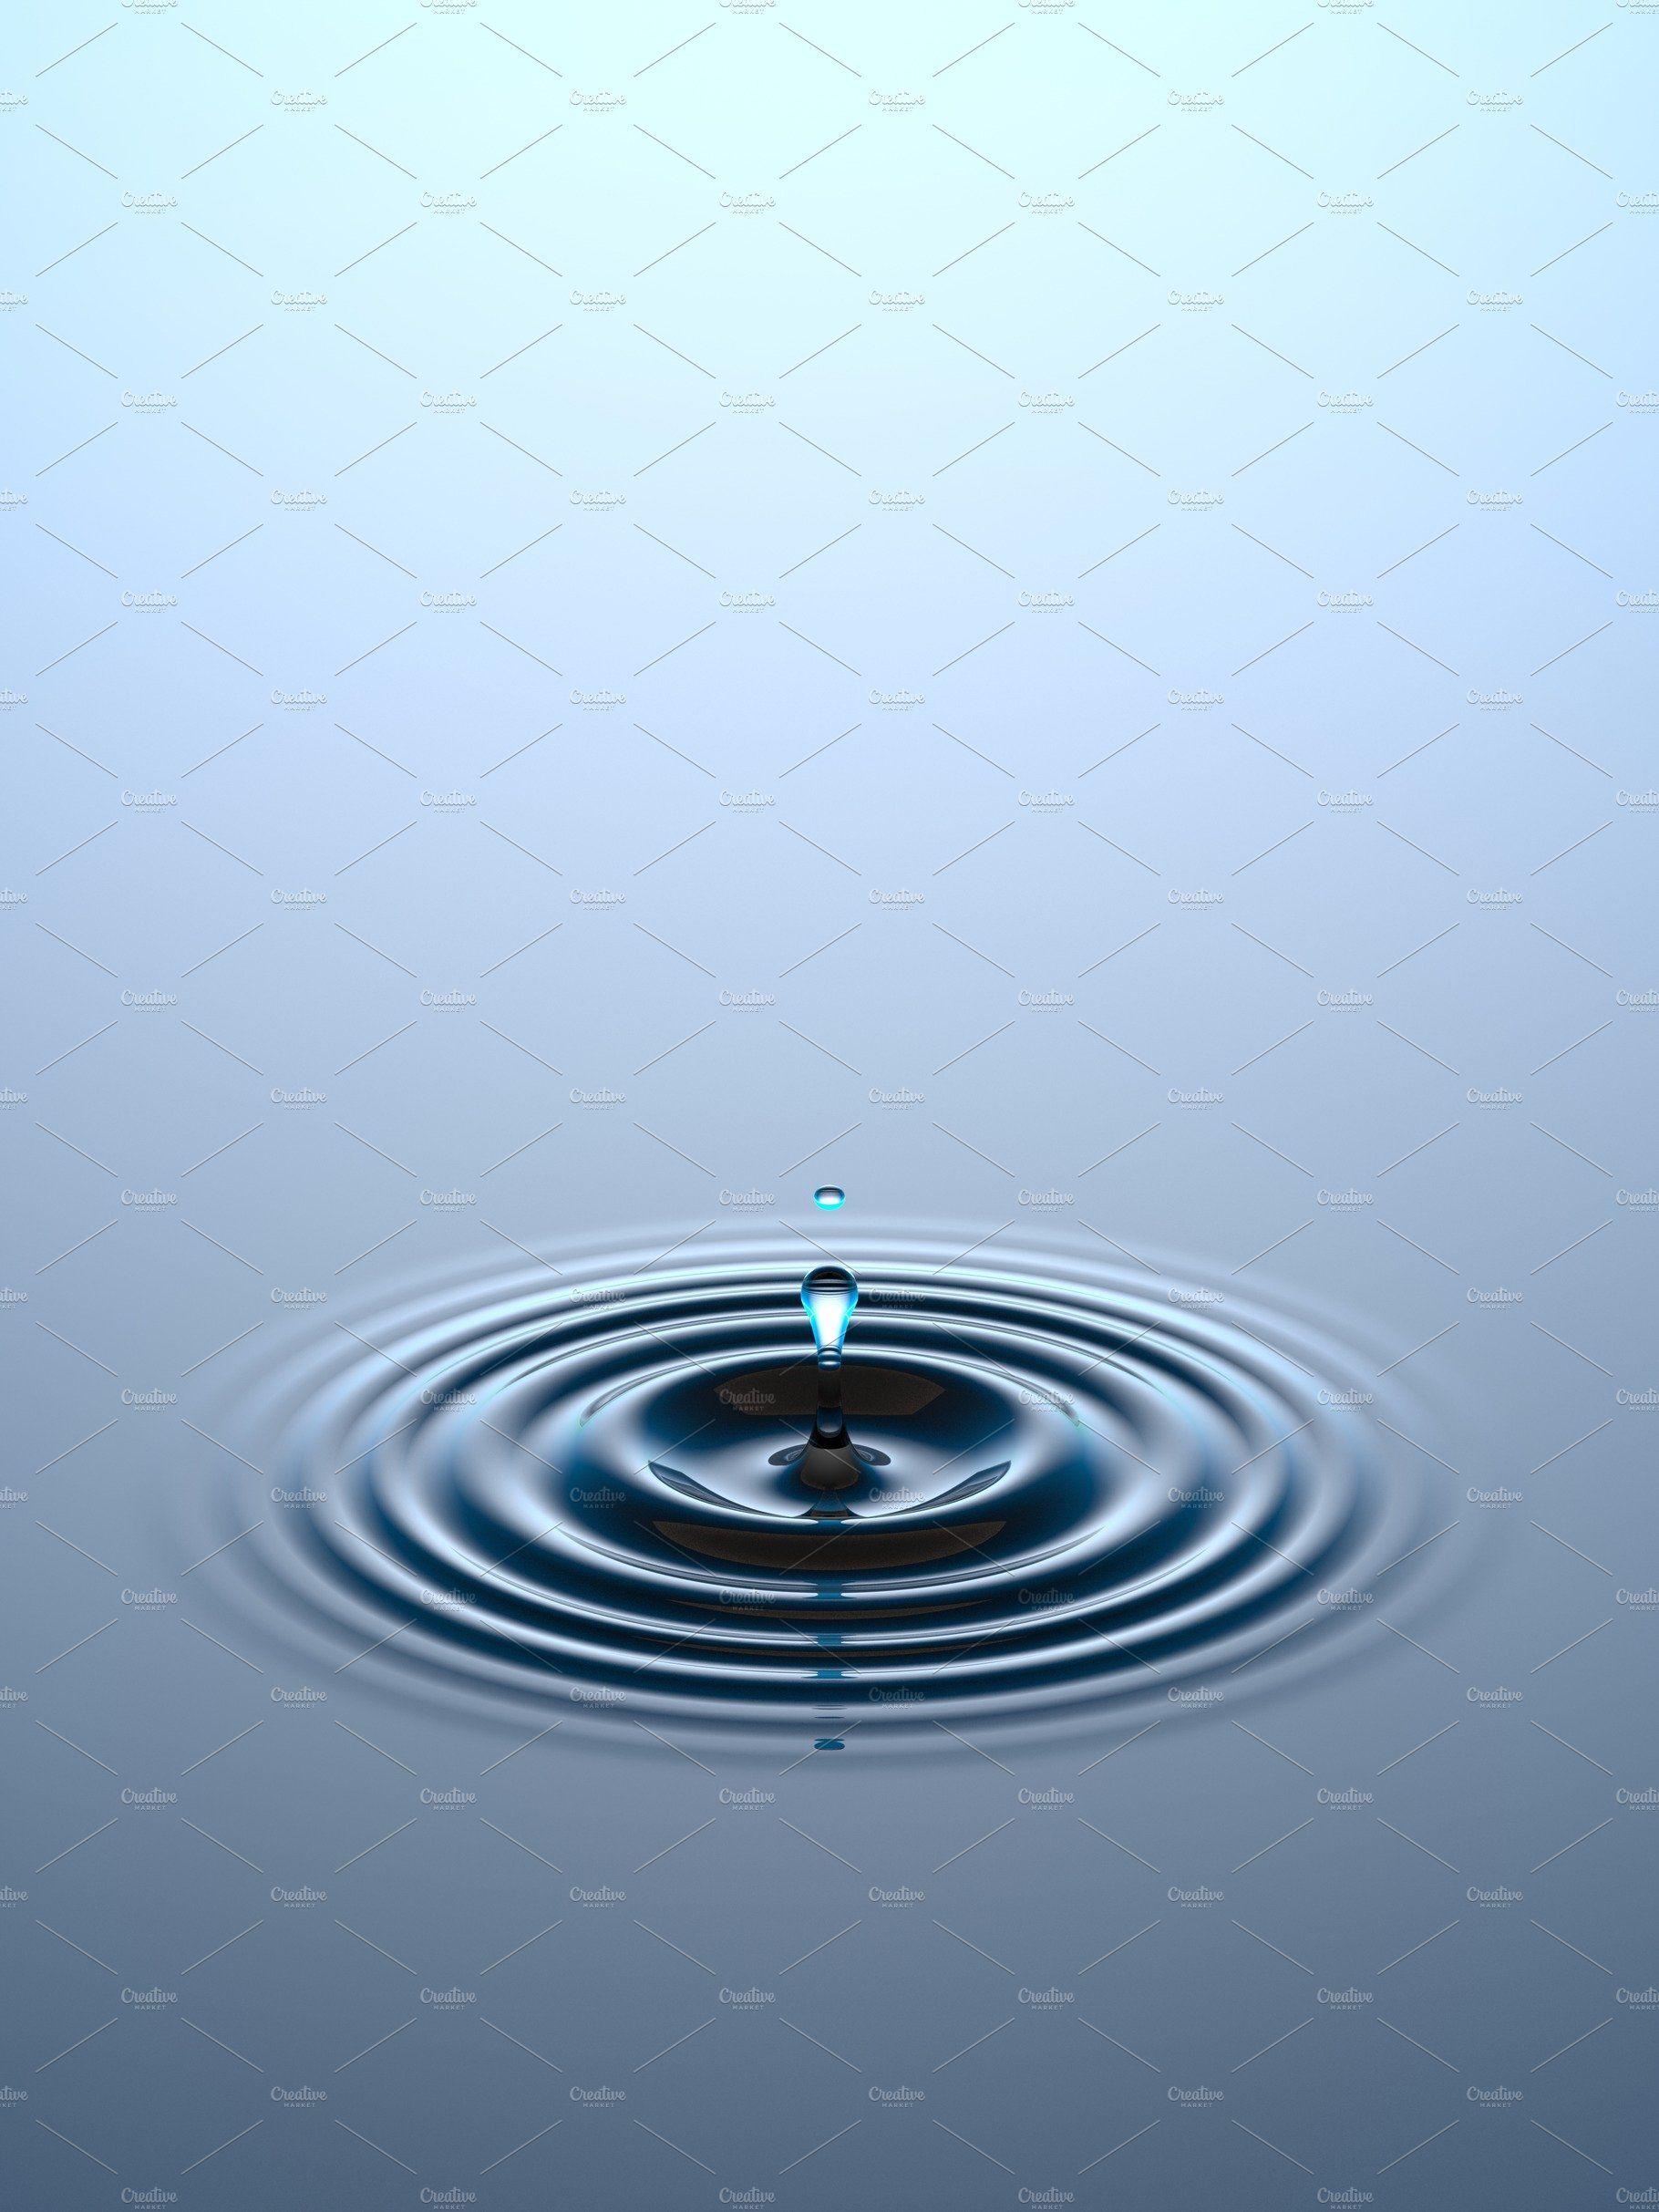 Water Drop Falling Into Water Surface Water Drop Drawing Water Drops Water Drawing Wallpaper drops water rain glare macro